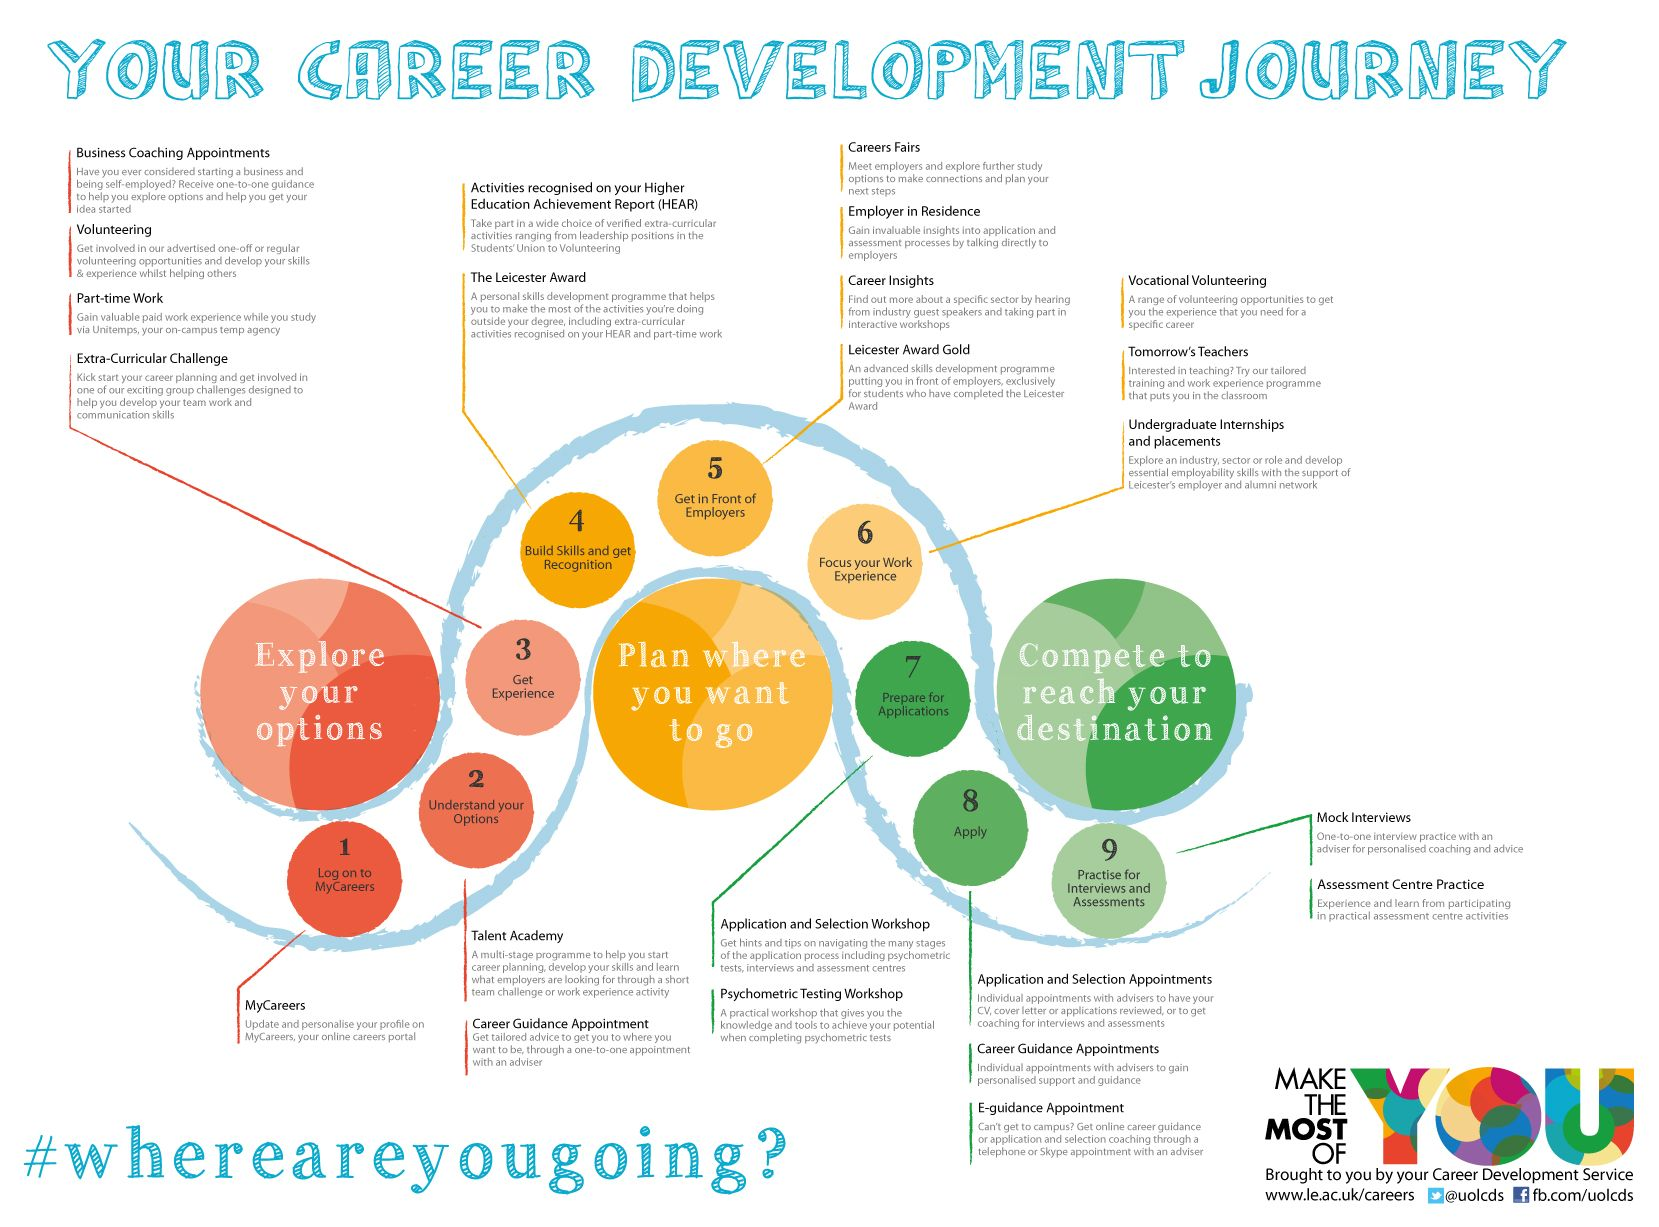 Career Development Journey Map